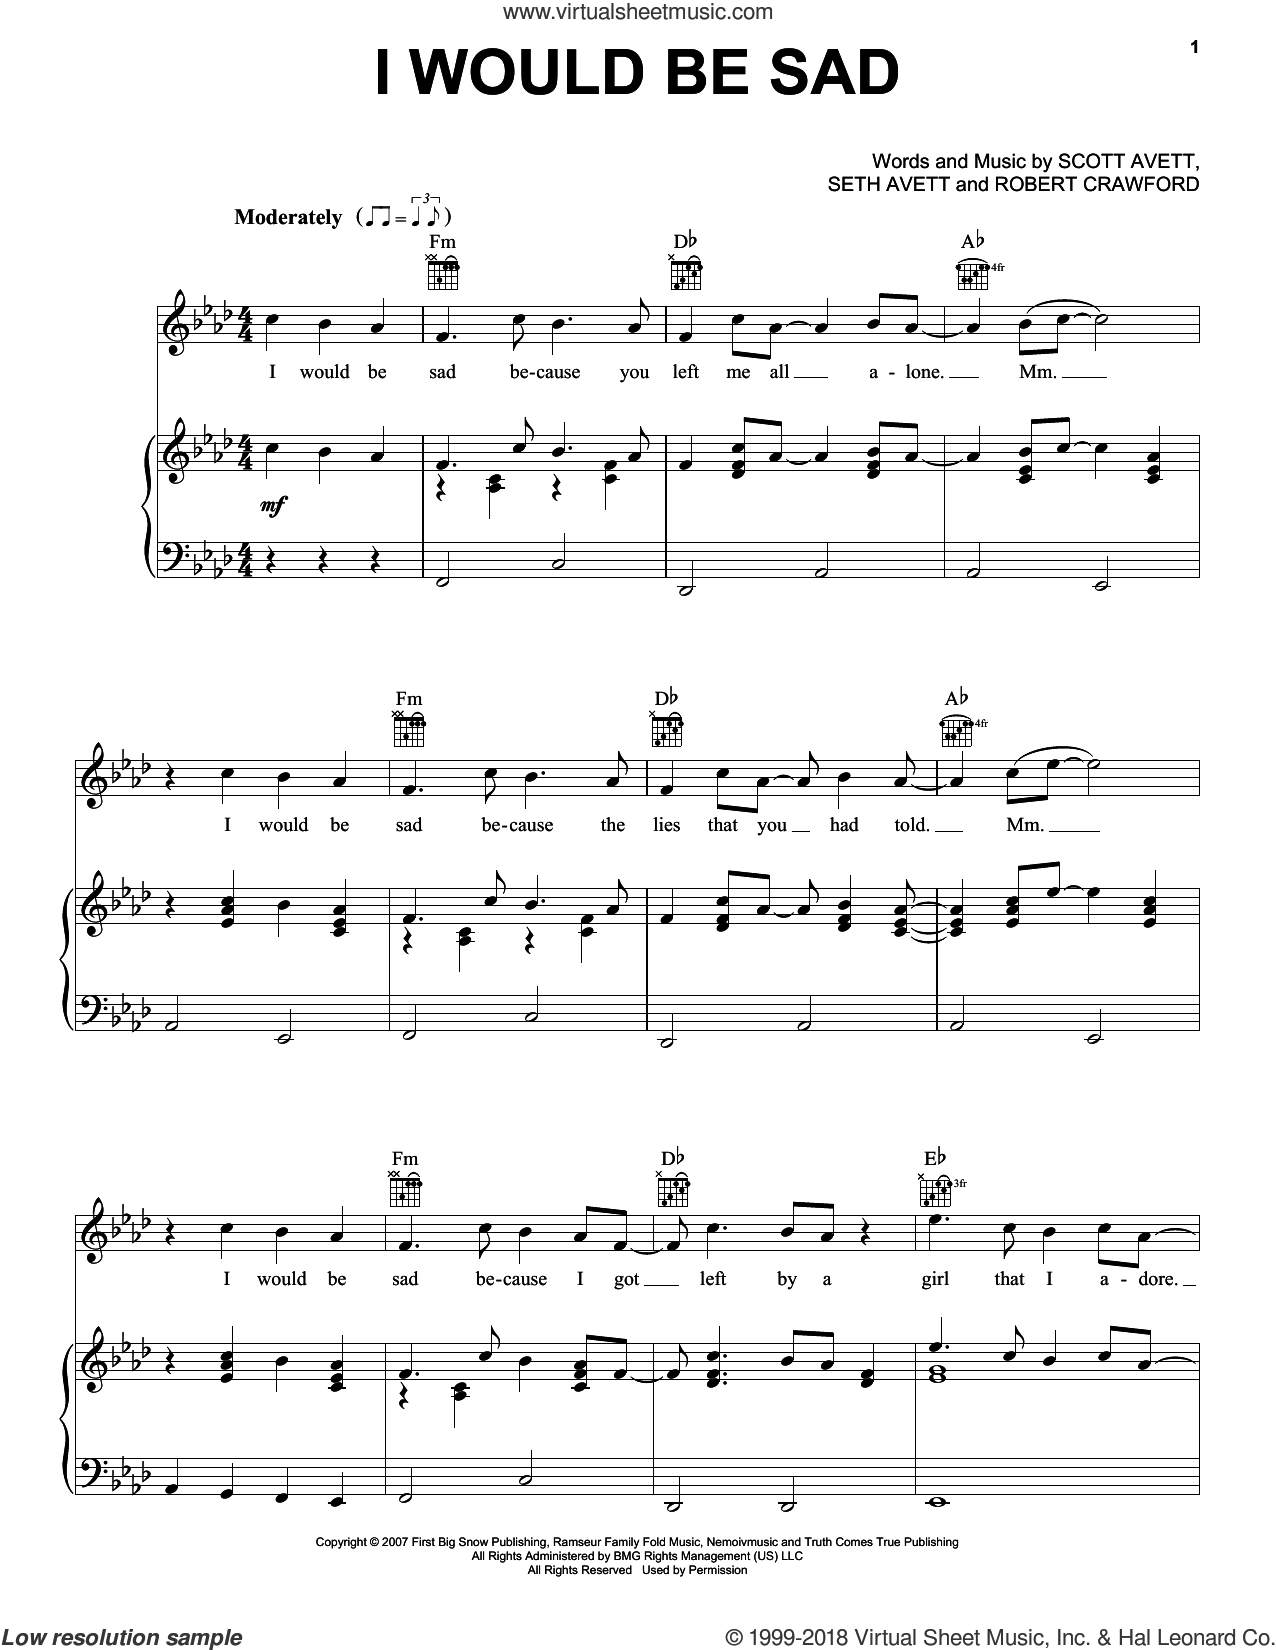 I Would Be Sad sheet music for voice, piano or guitar by The Avett Brothers, Avett Brothers, Robert Crawford, Scott Avett and Seth Avett, intermediate skill level